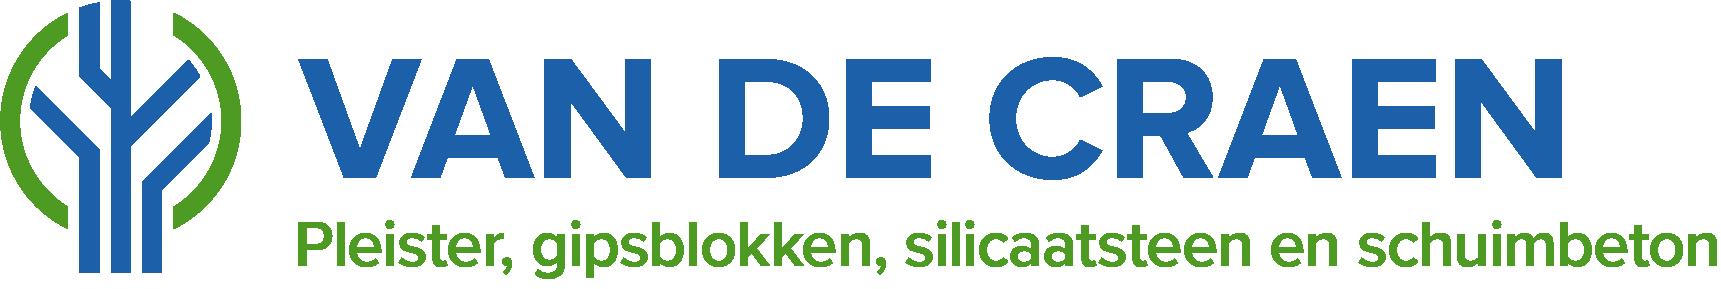 VanDeCraen_logo_RGB